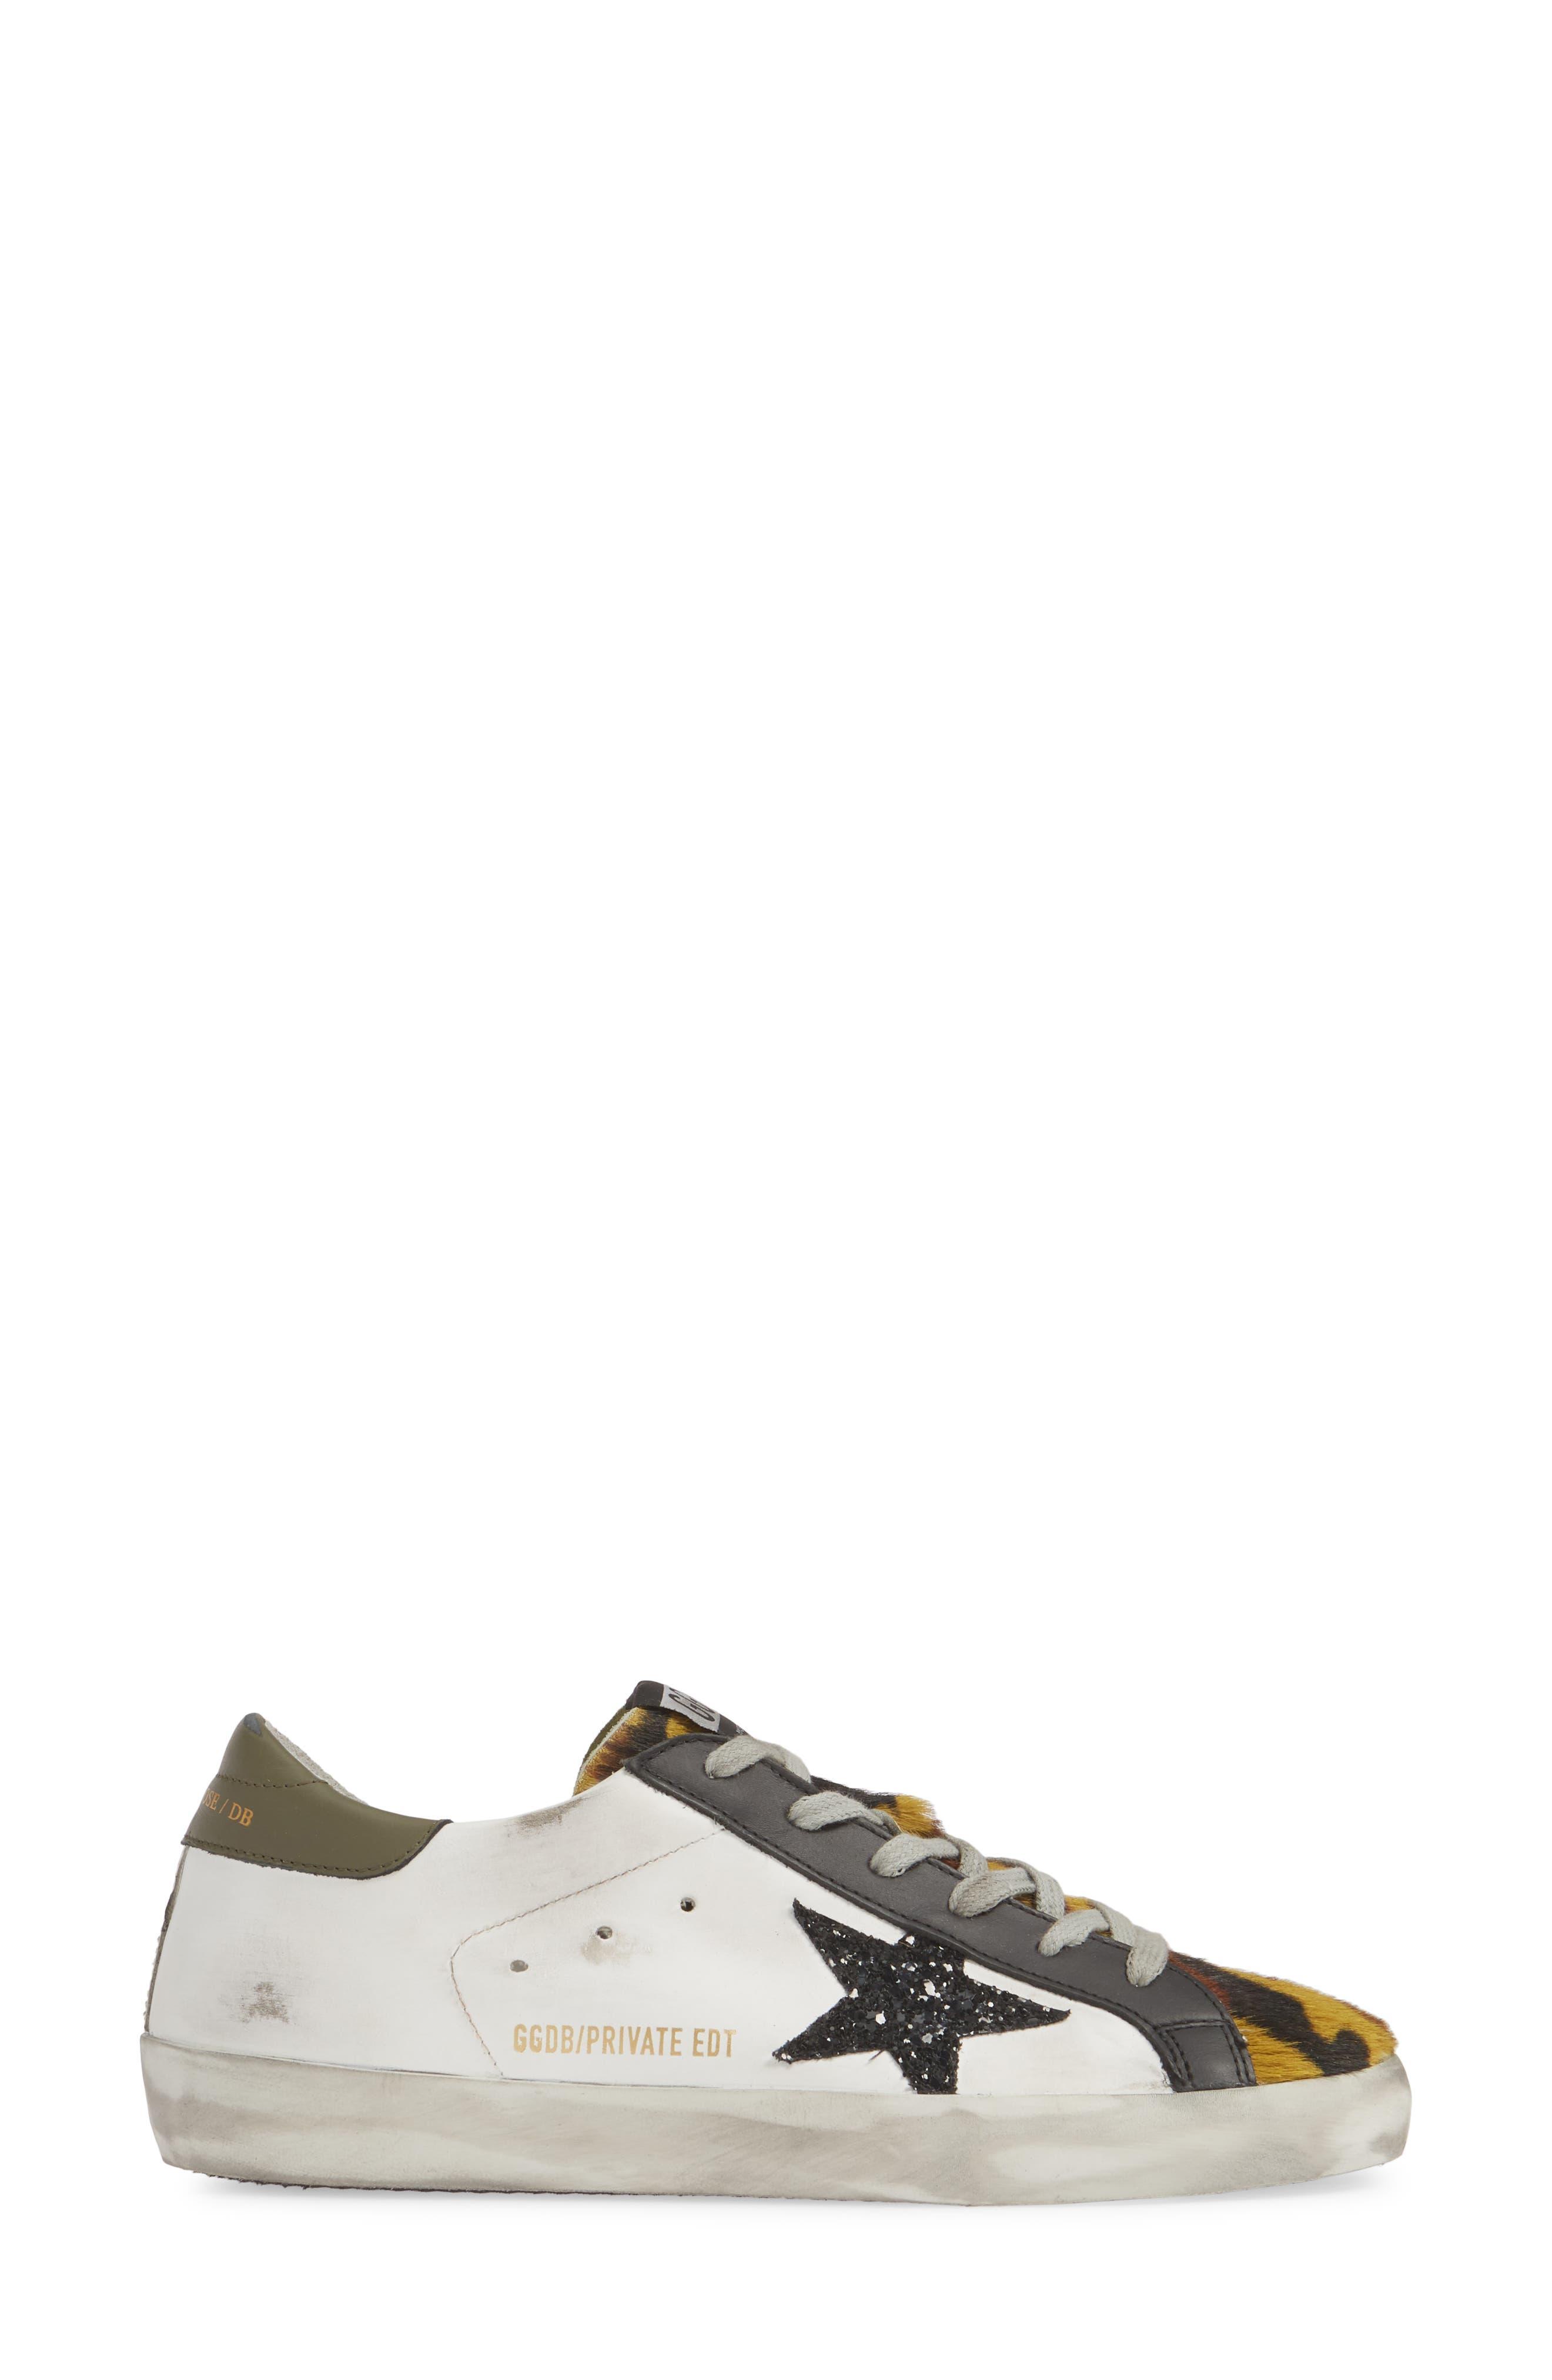 GOLDEN GOOSE,                             Superstar Genuine Calf Hair Sneaker,                             Alternate thumbnail 3, color,                             WHITE/ CAMO